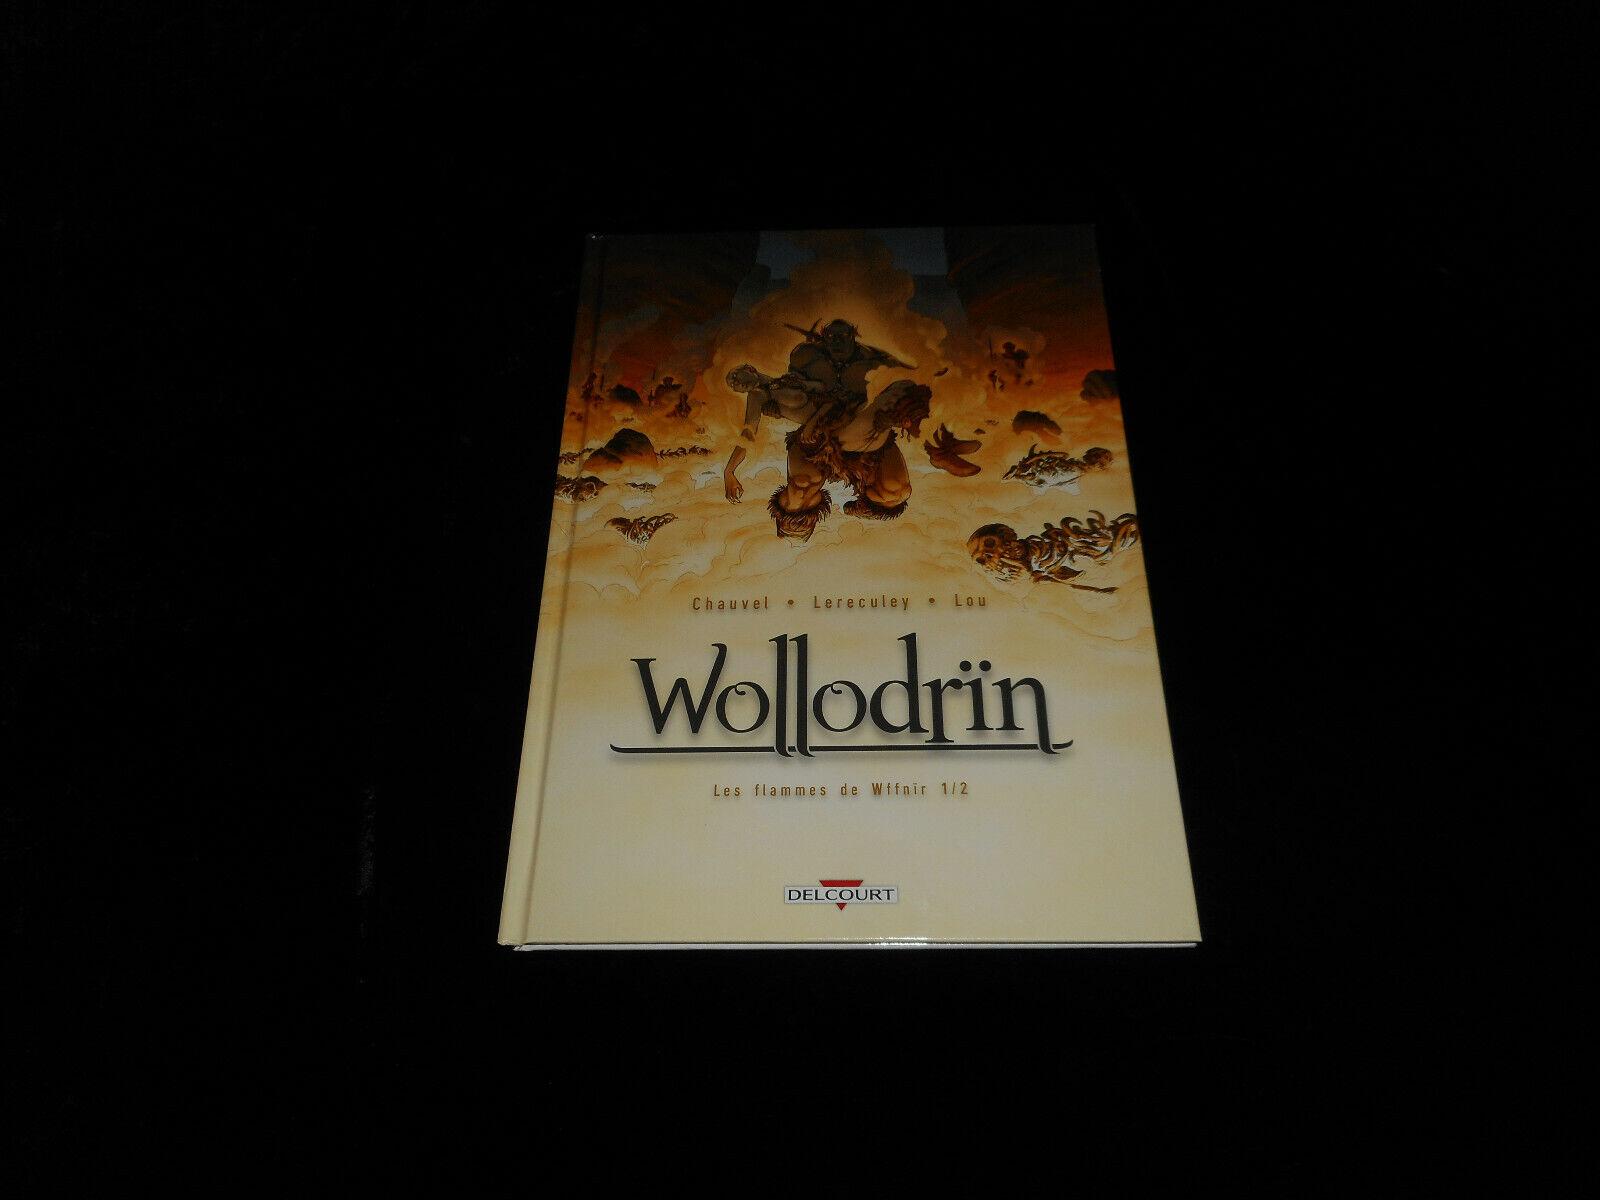 Chauvel / Lereculey : Wollodrïn 7 : Les flammes de Wiffnir 1 Delcourt DL 05/2016